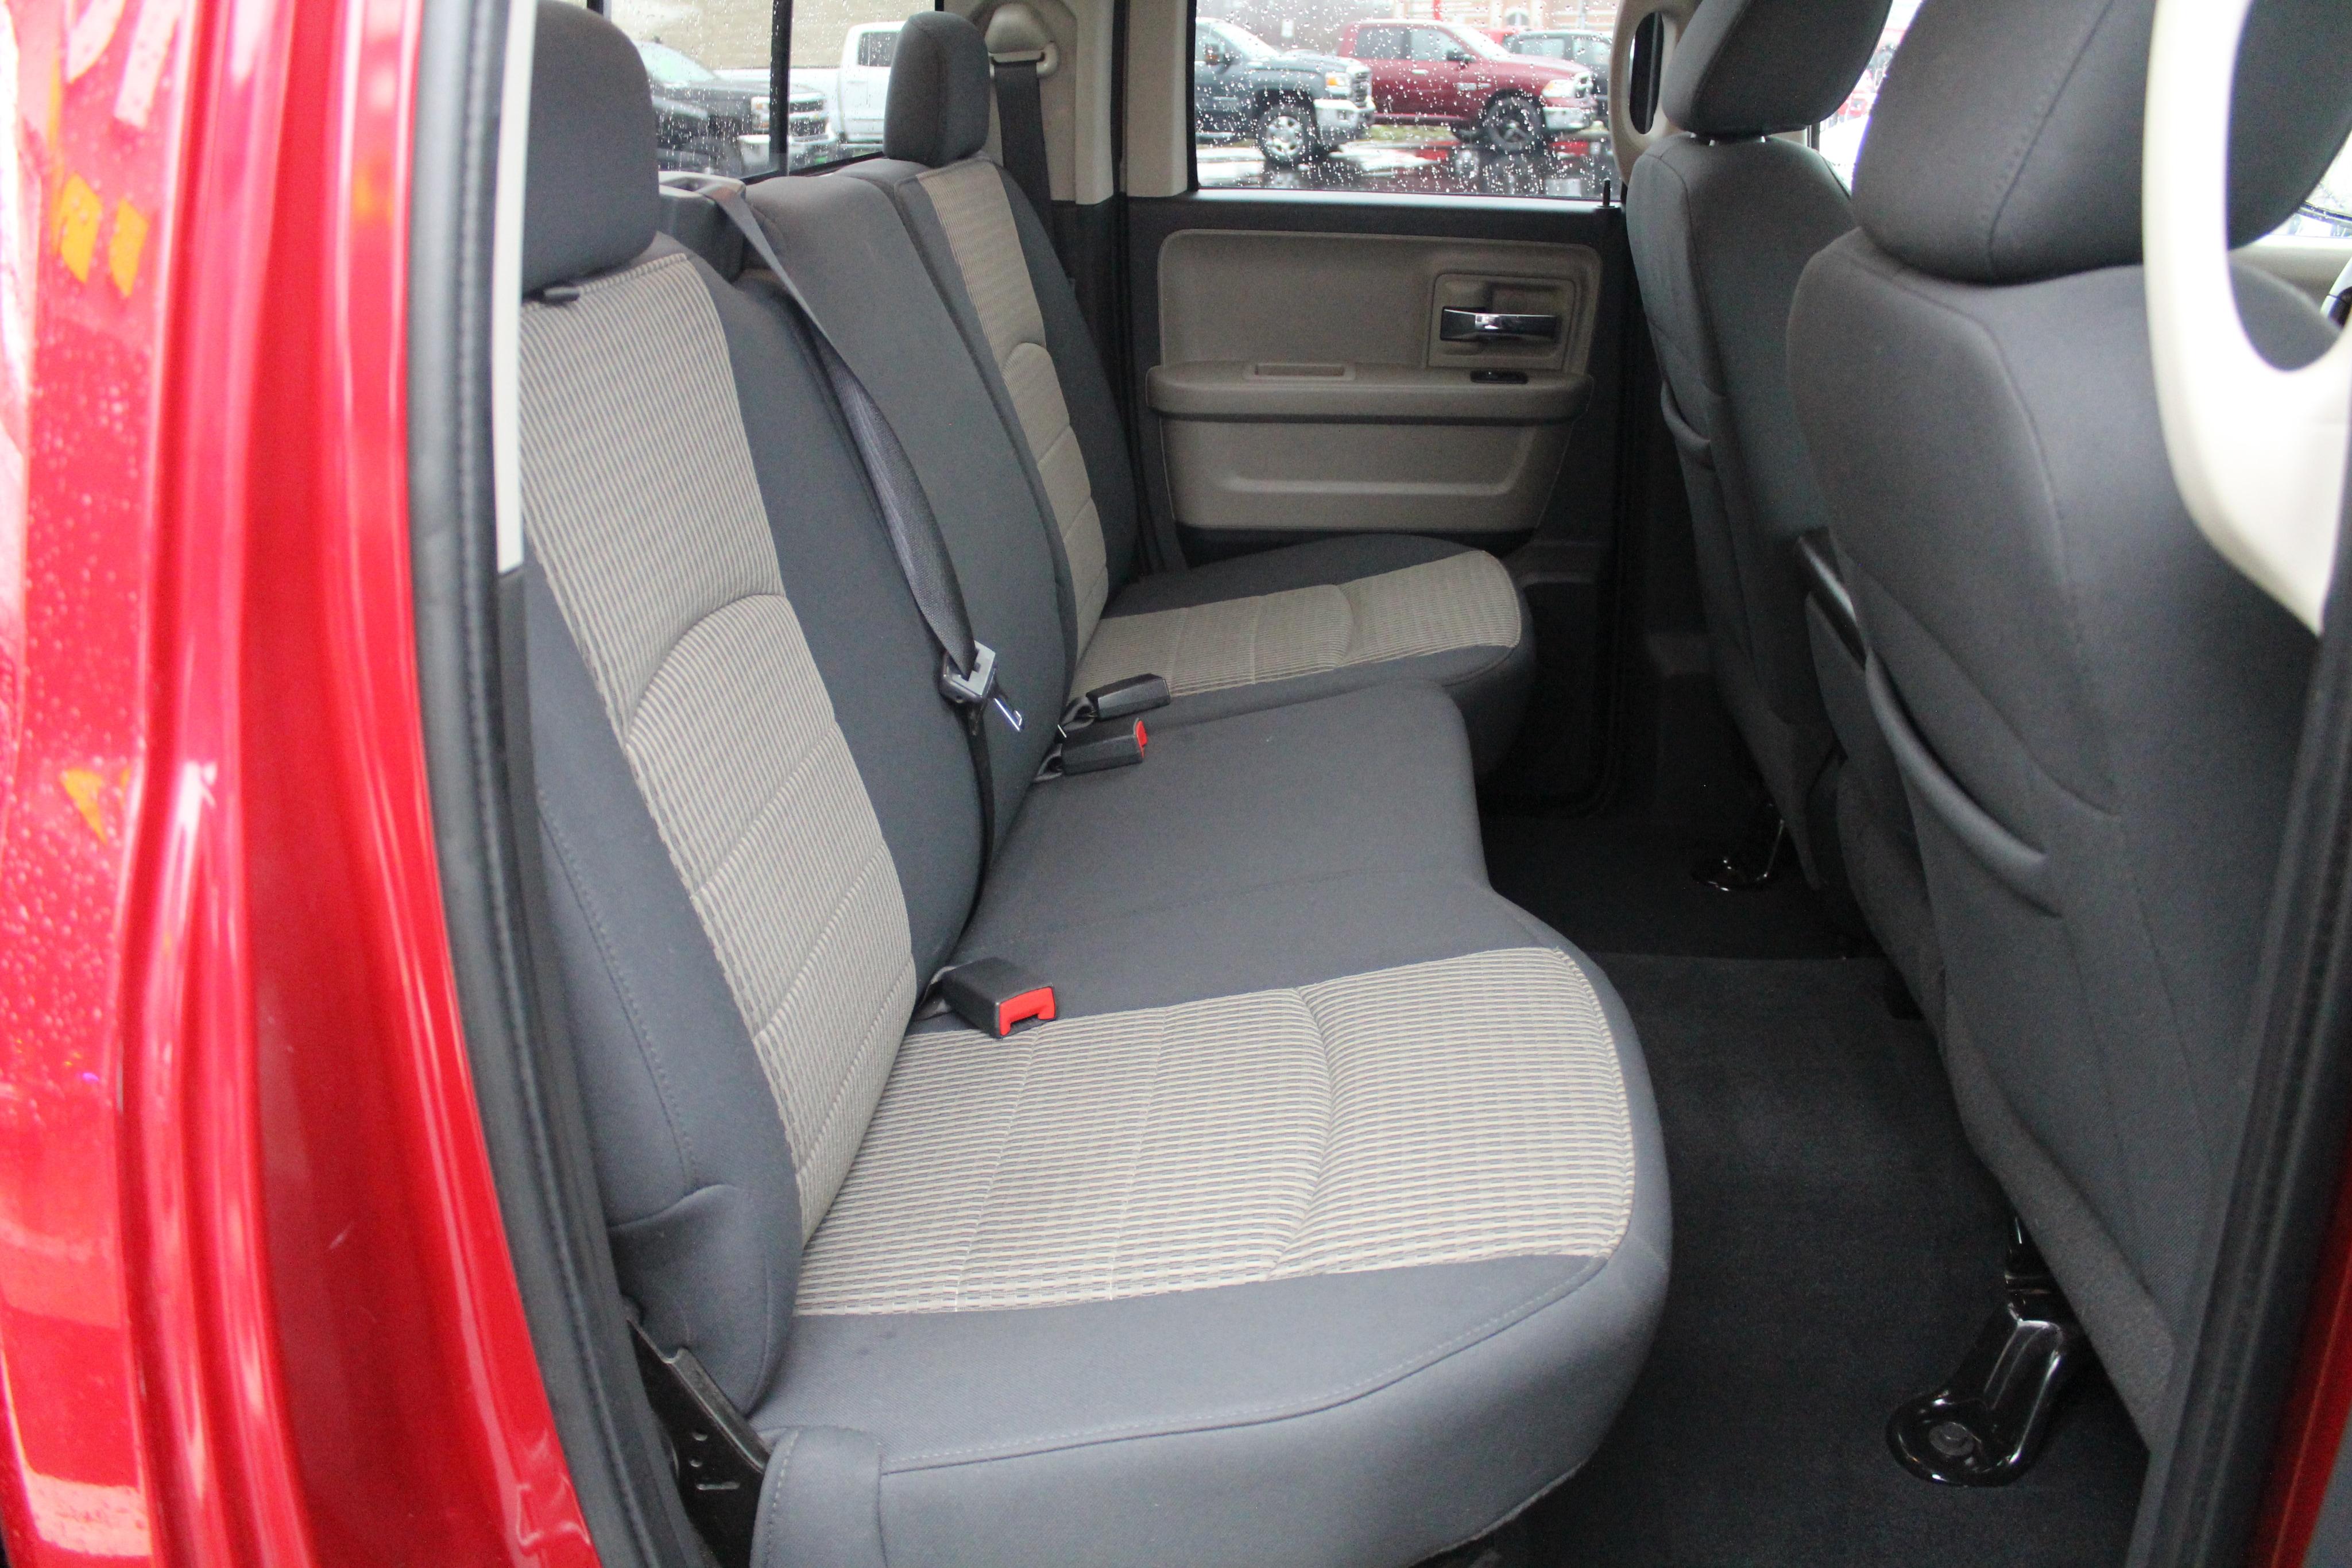 2009 Dodge Ram 1500 Crew Pickup